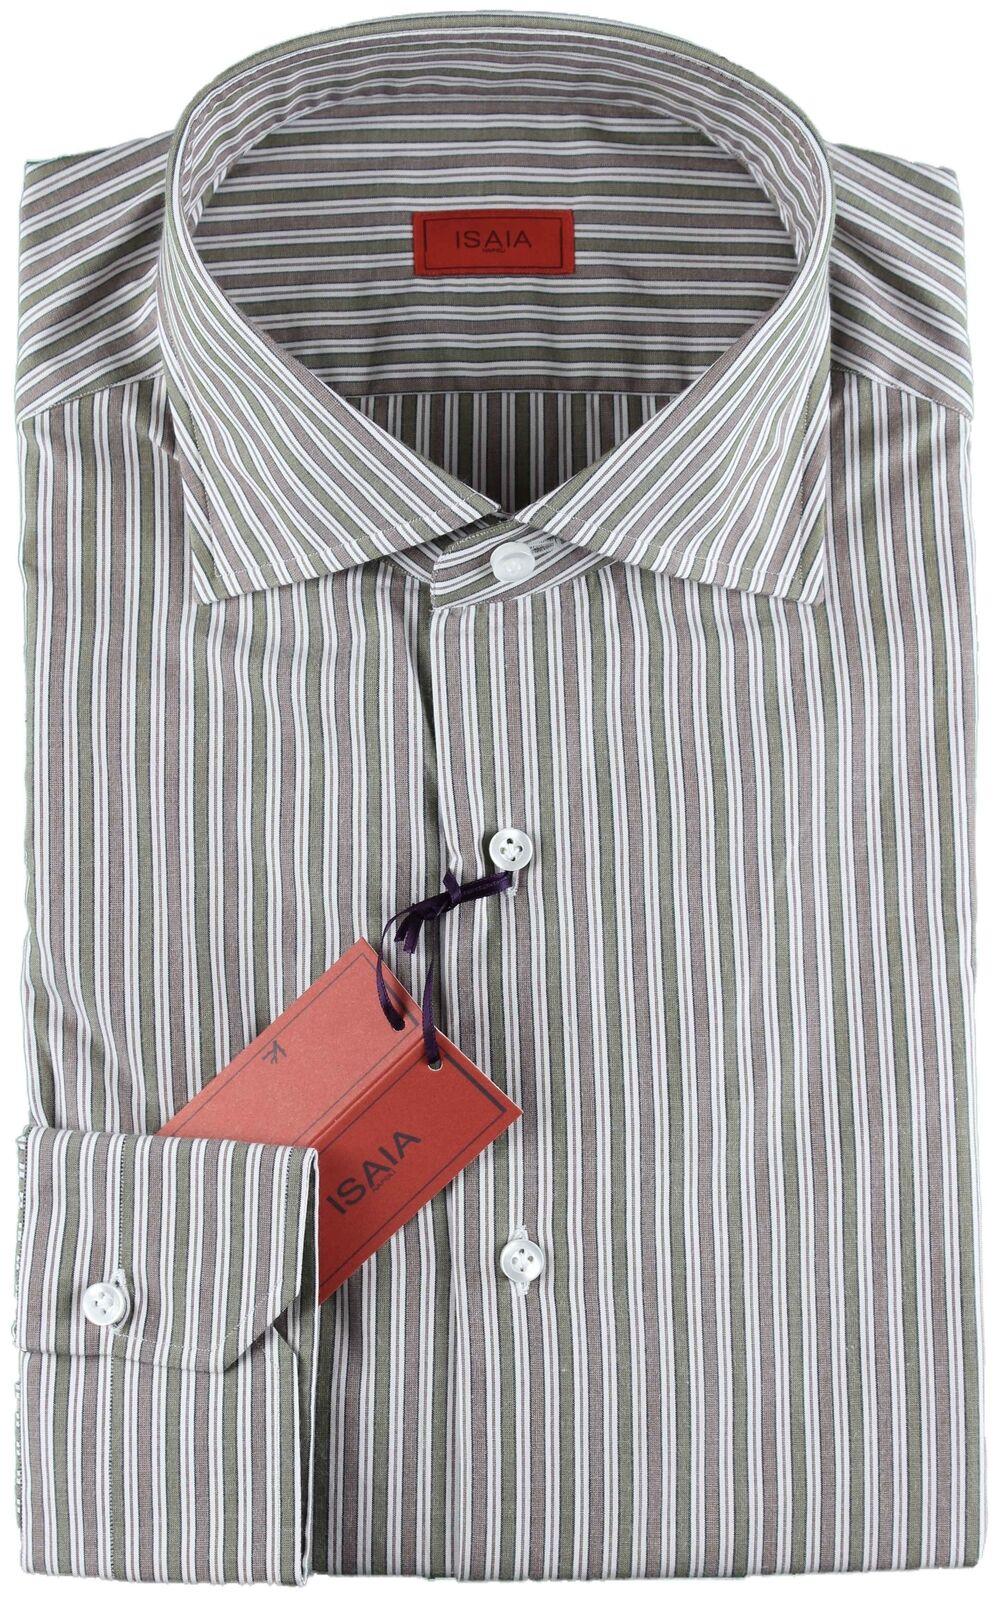 NWT ISAIA hemd Weiß, Grün & beaver striped luxury verbreitung handmade  41 16